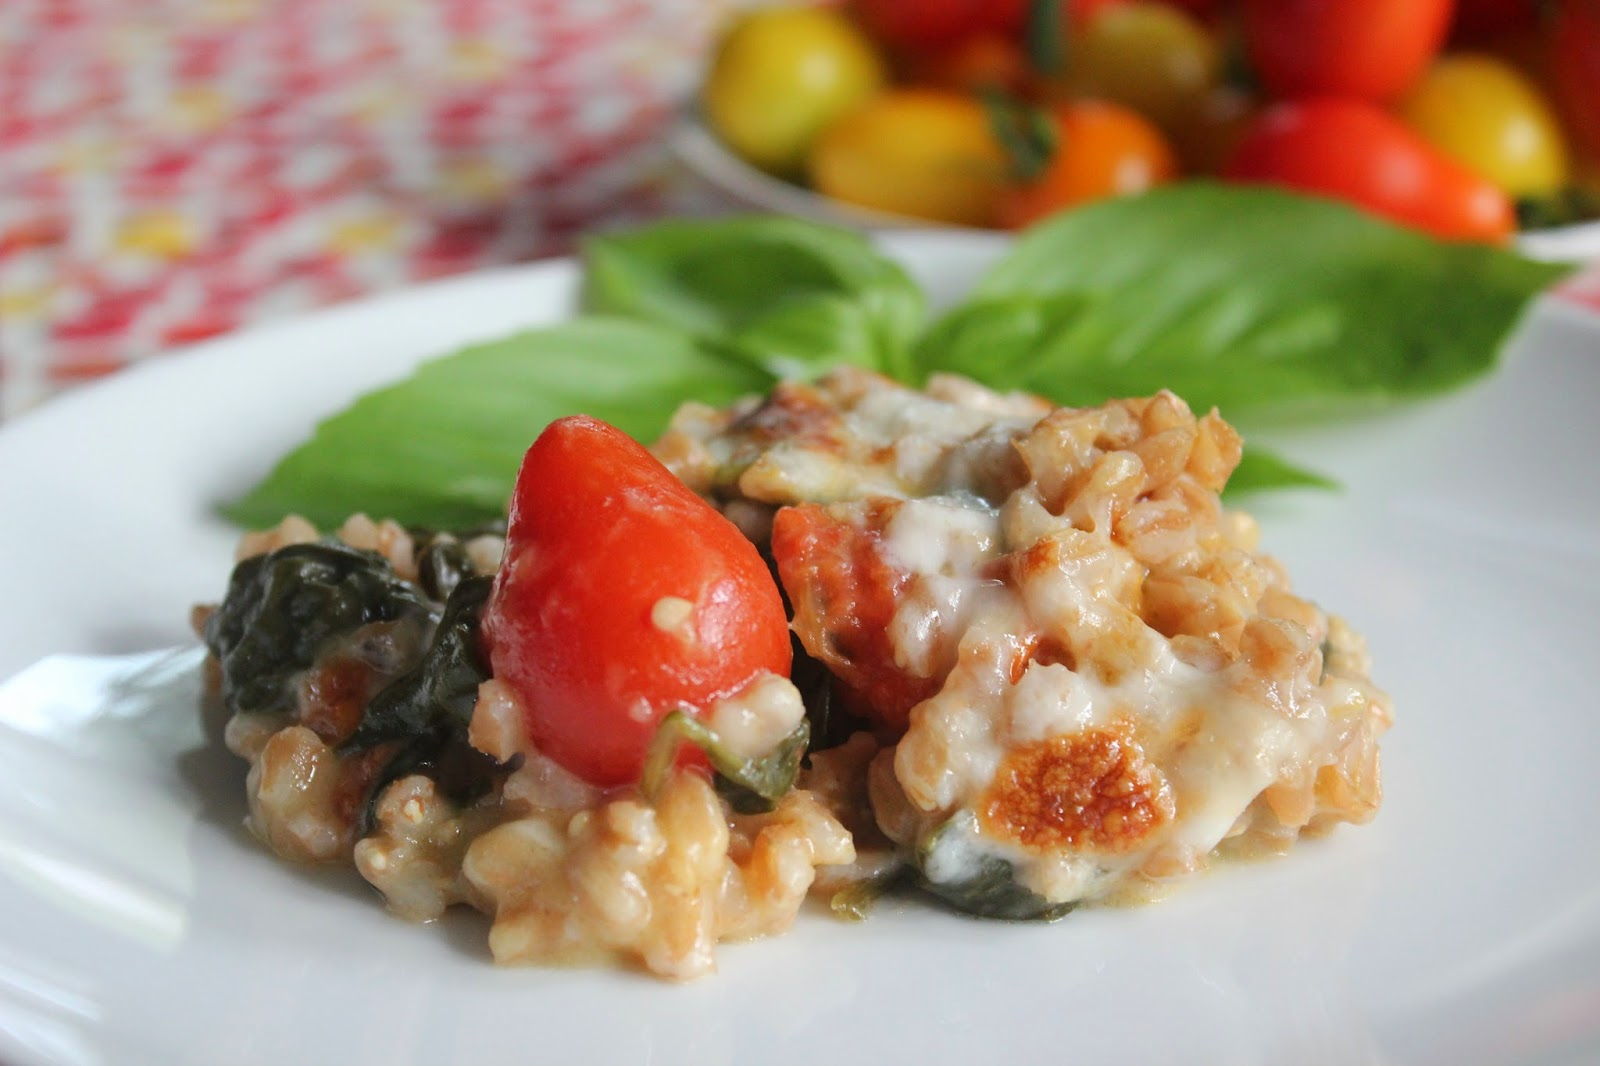 Roasted tomato farro bake